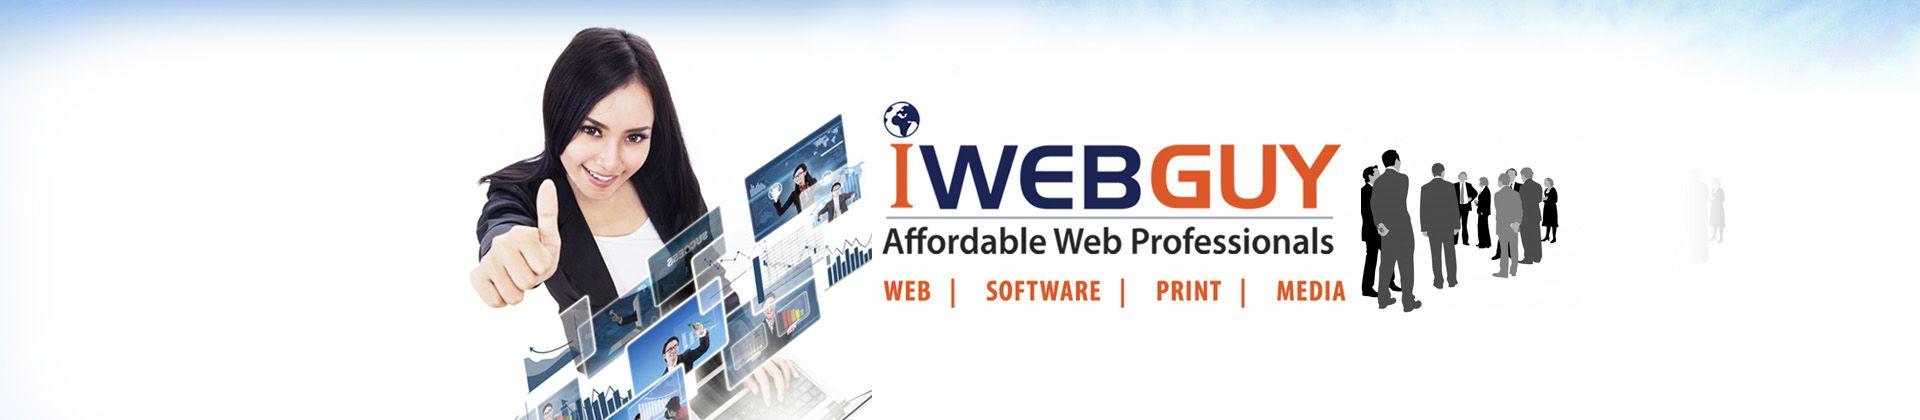 Web Design In Calgary By Iwebguy Web Design Web Development Company Web Software